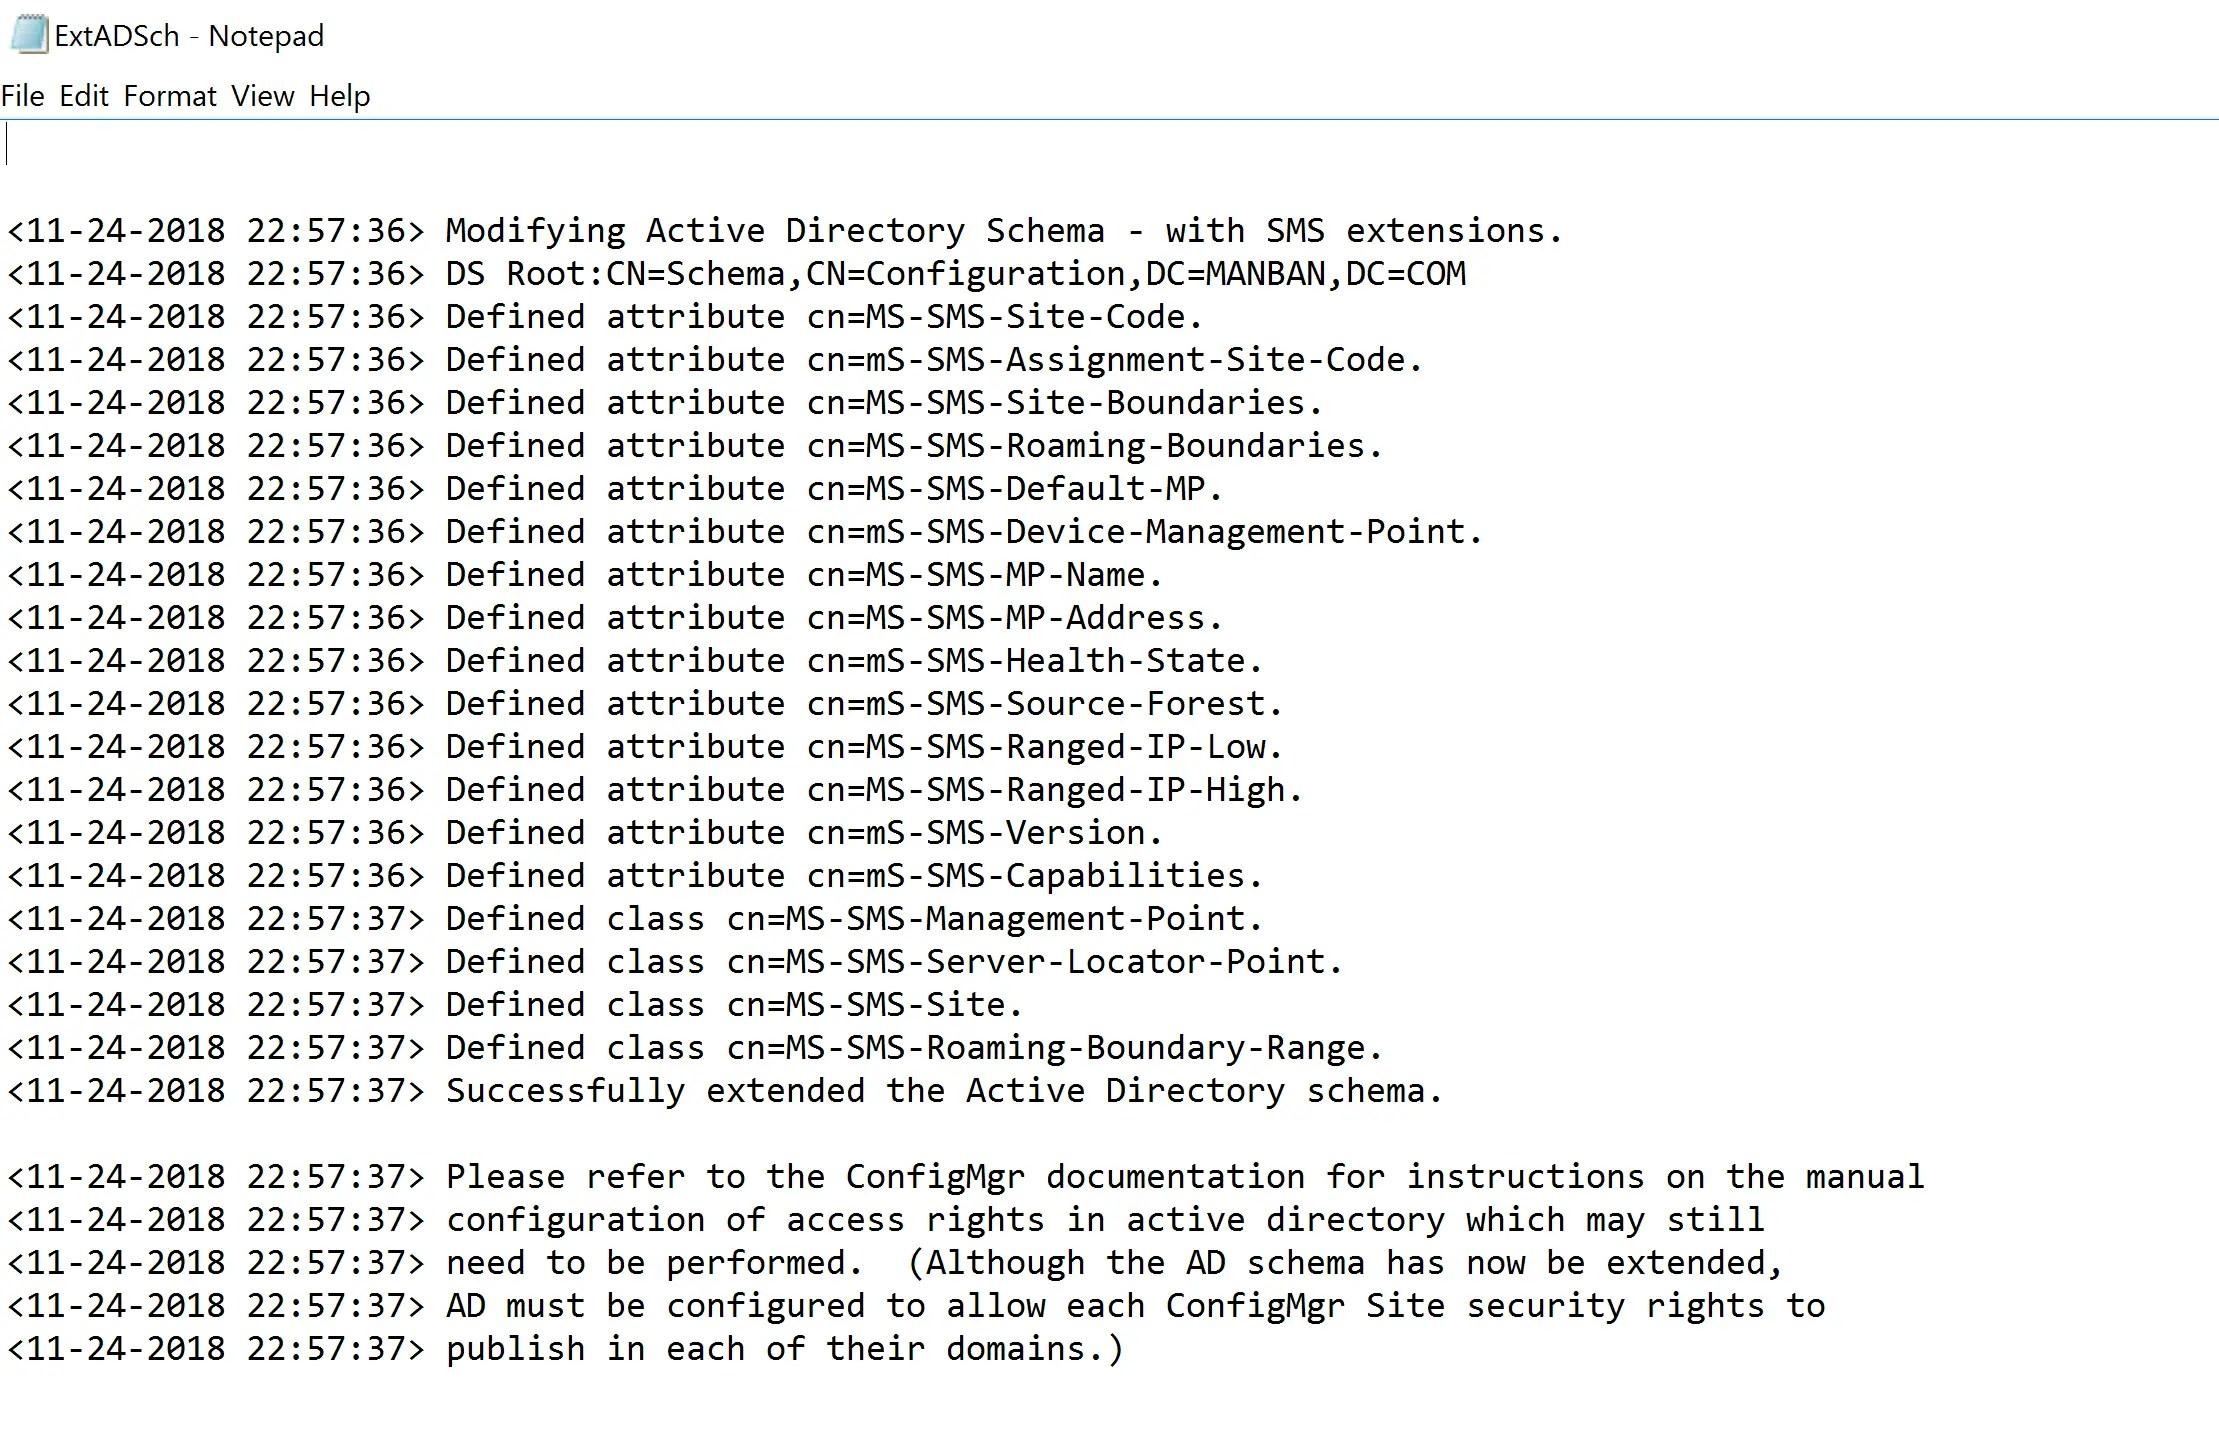 Preparing Active Directory for SCCM 12